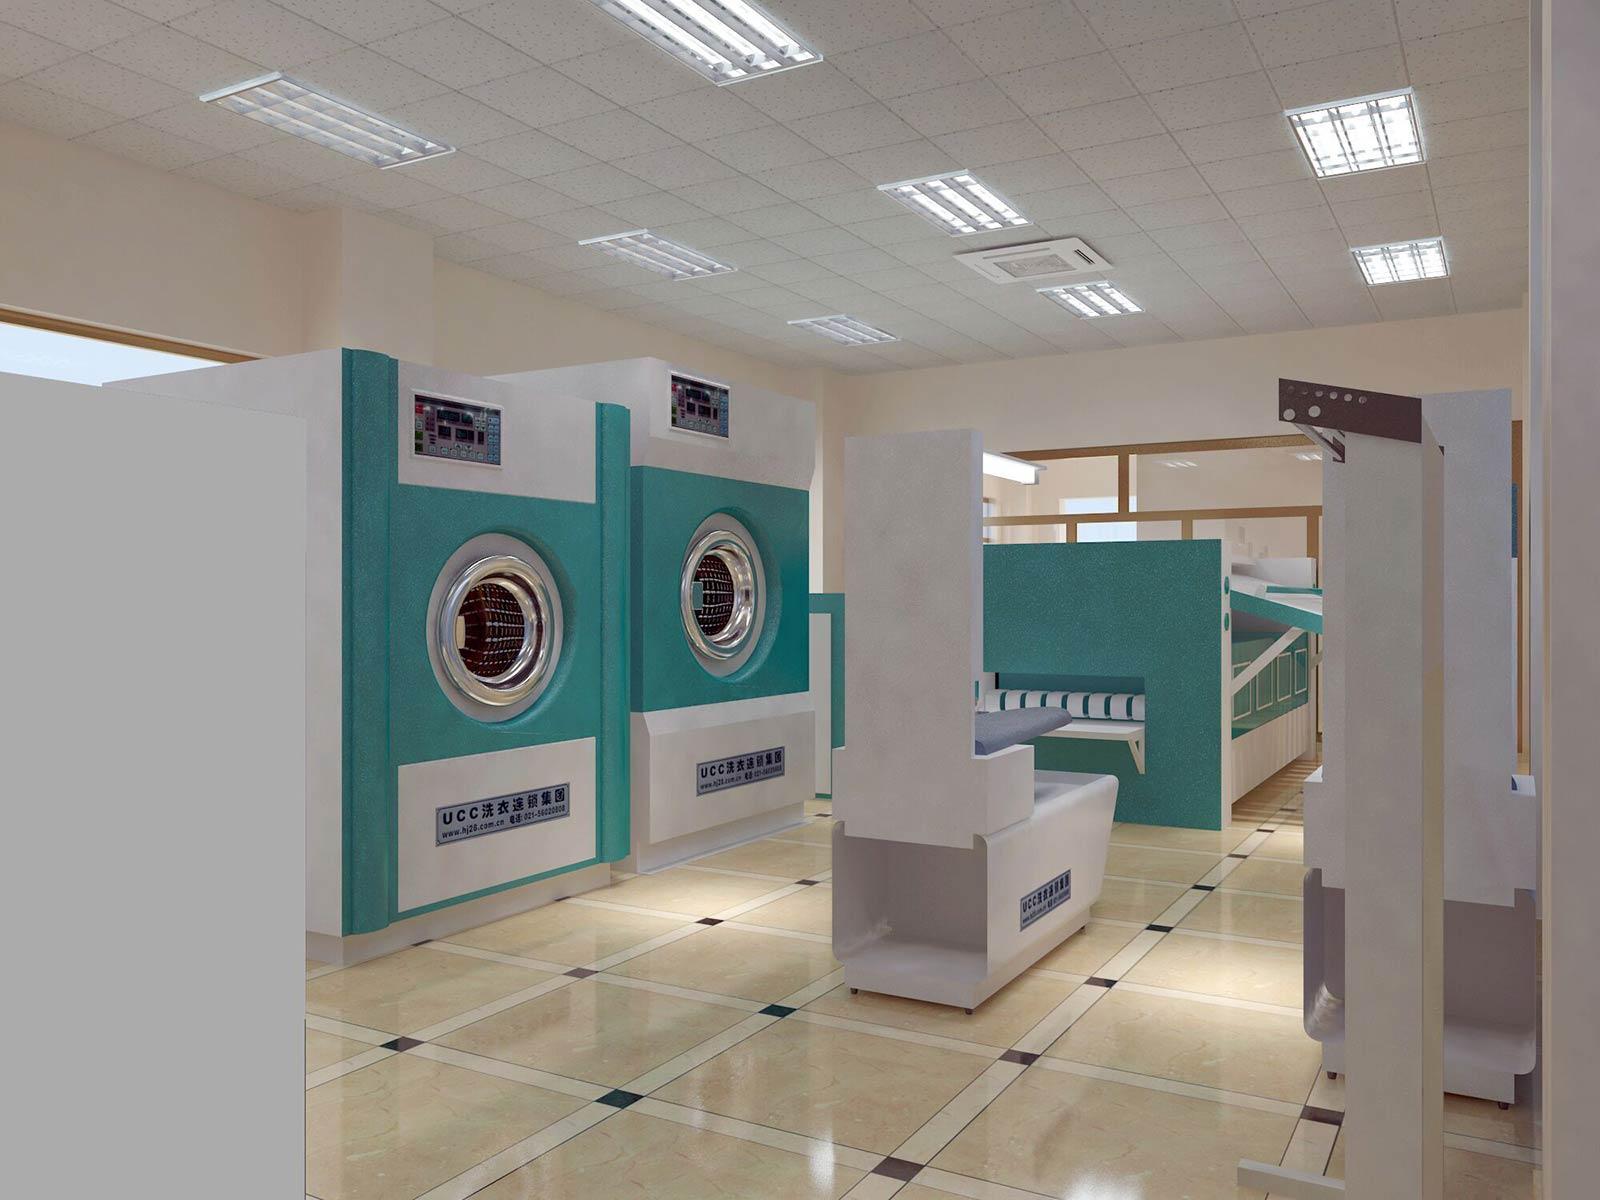 UCC国际洗衣干洗店加盟可靠吗?